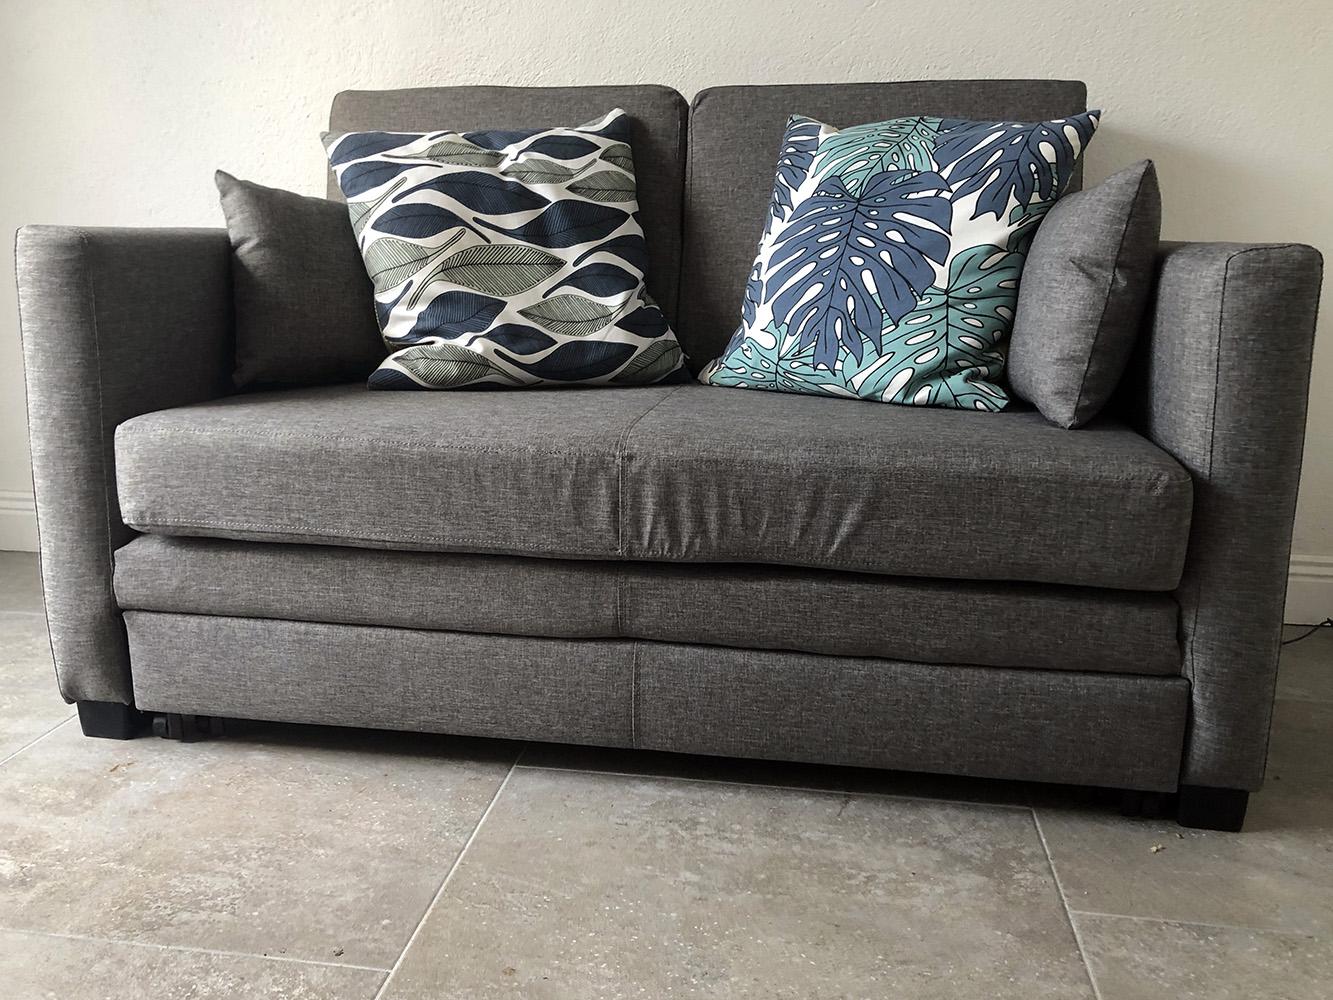 Graues Boom Sofa von Patrick